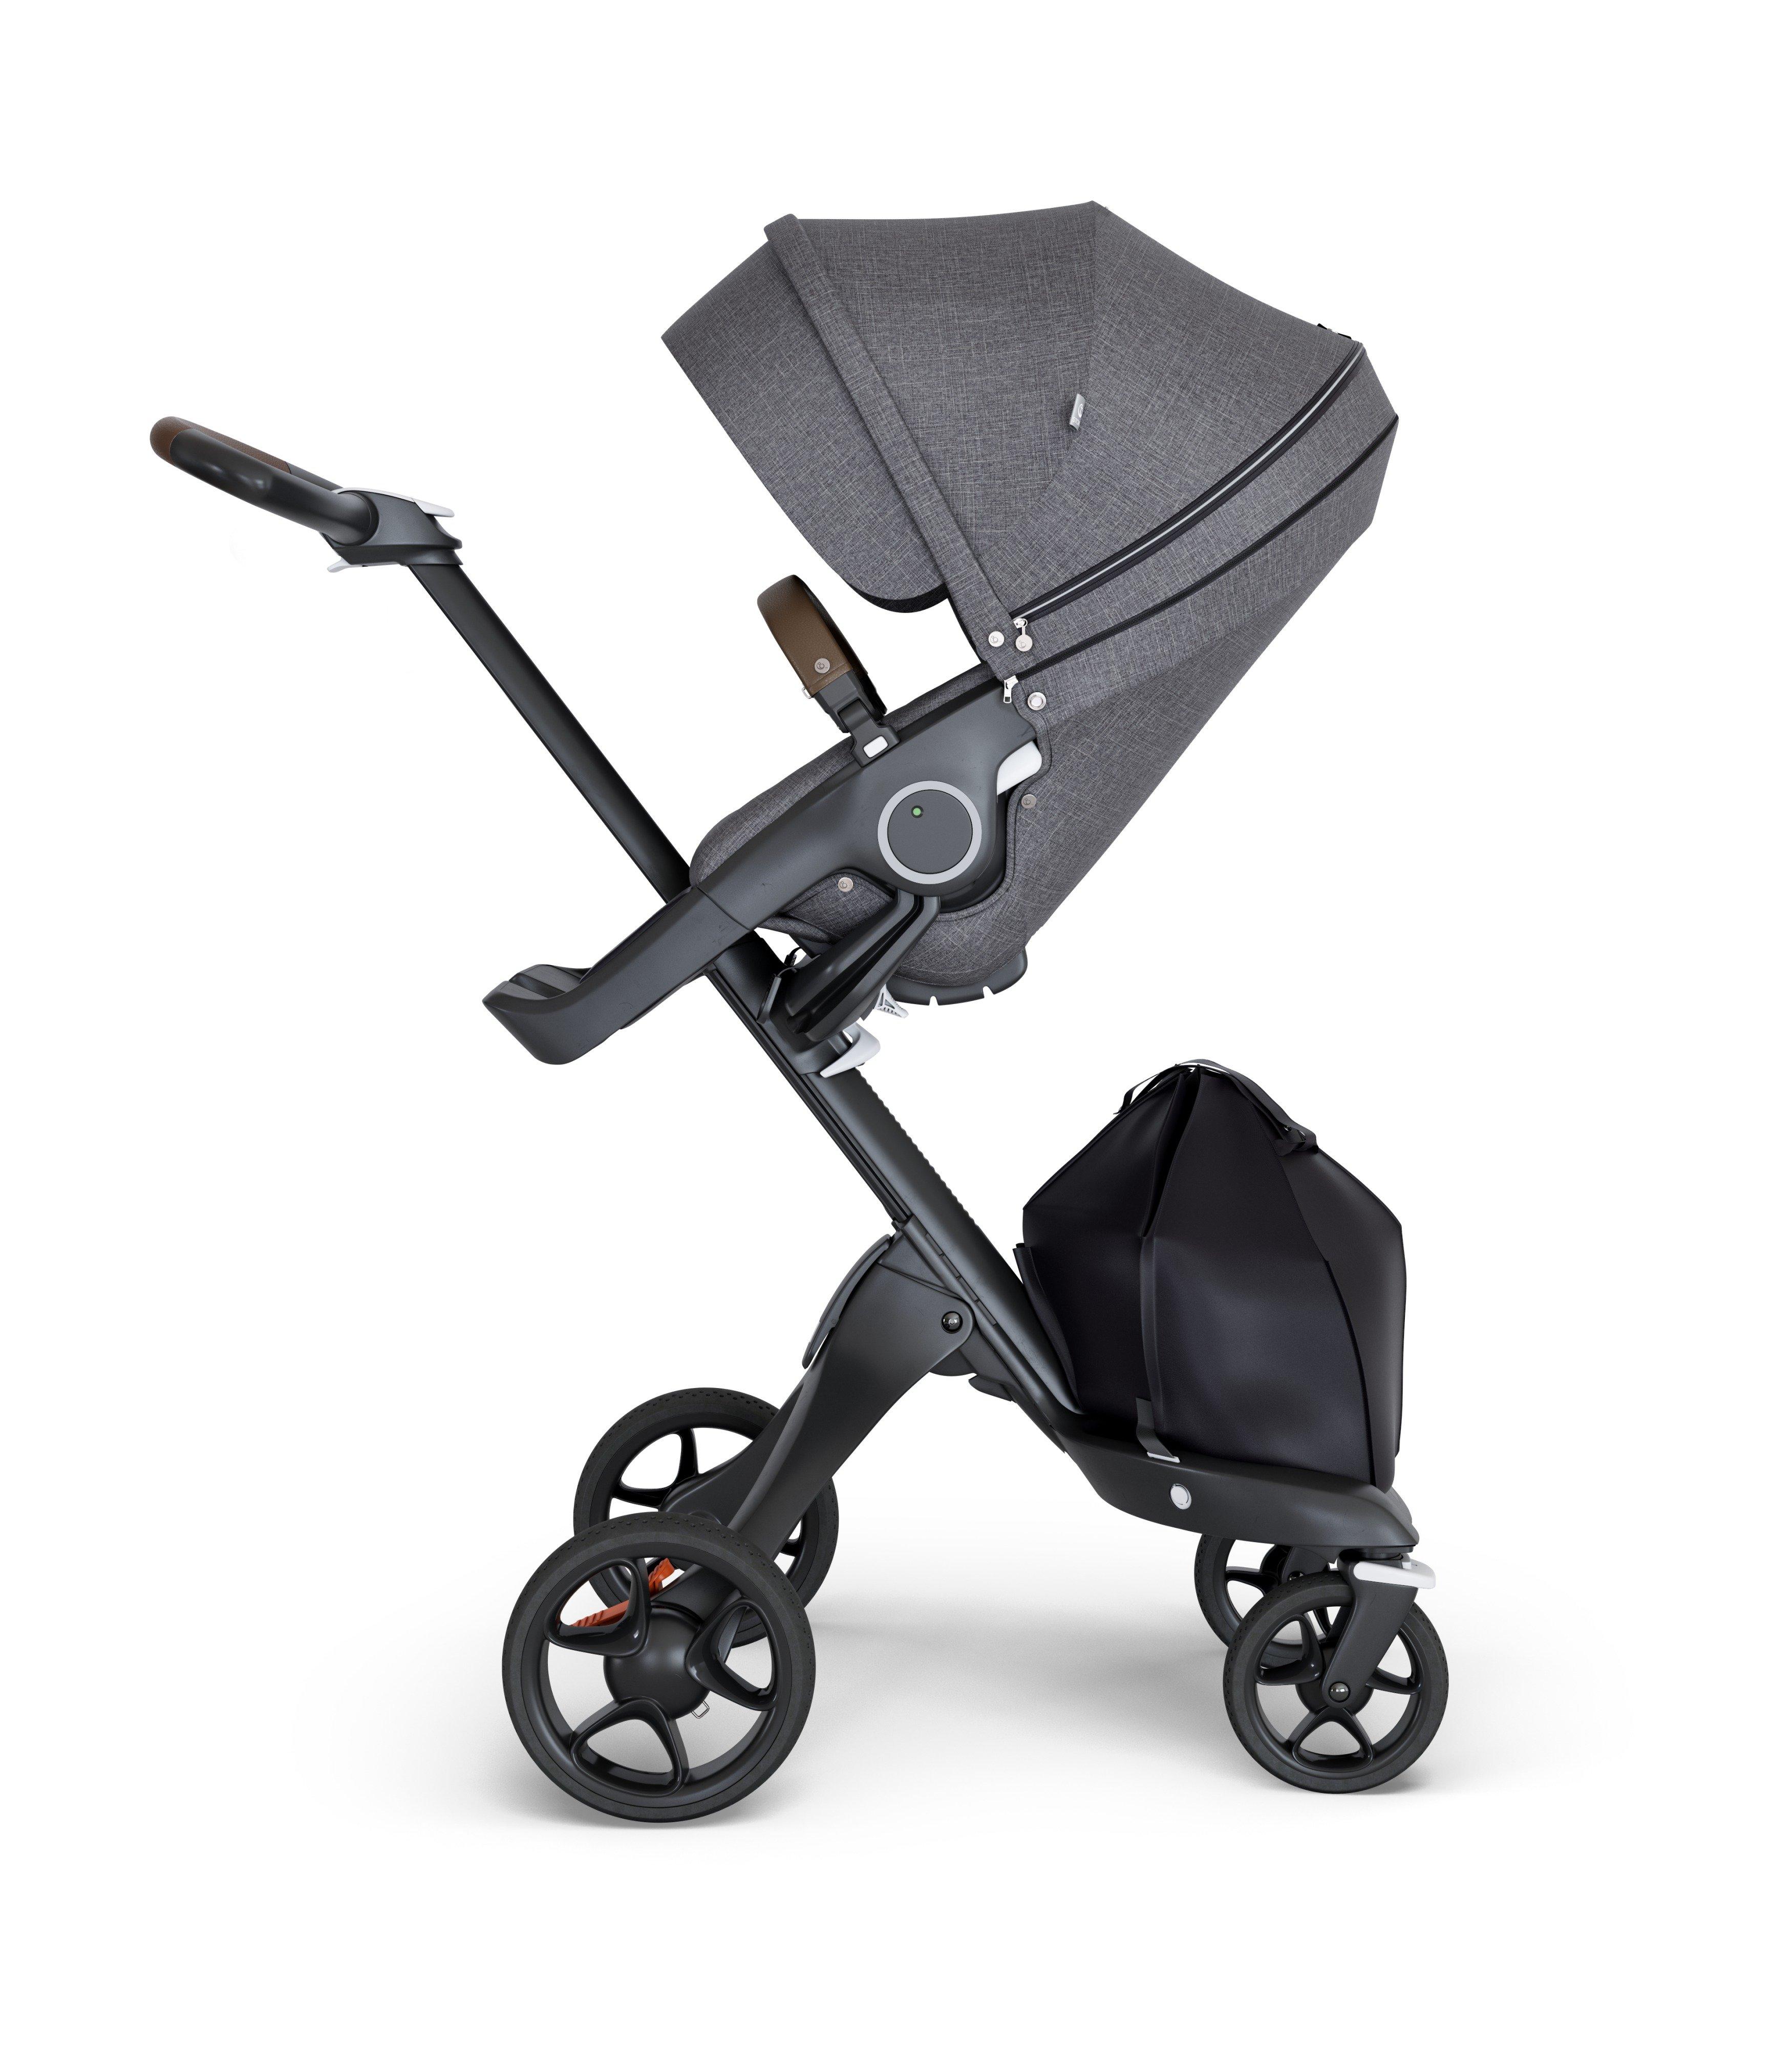 38+ Joolz hub stroller 2018 information